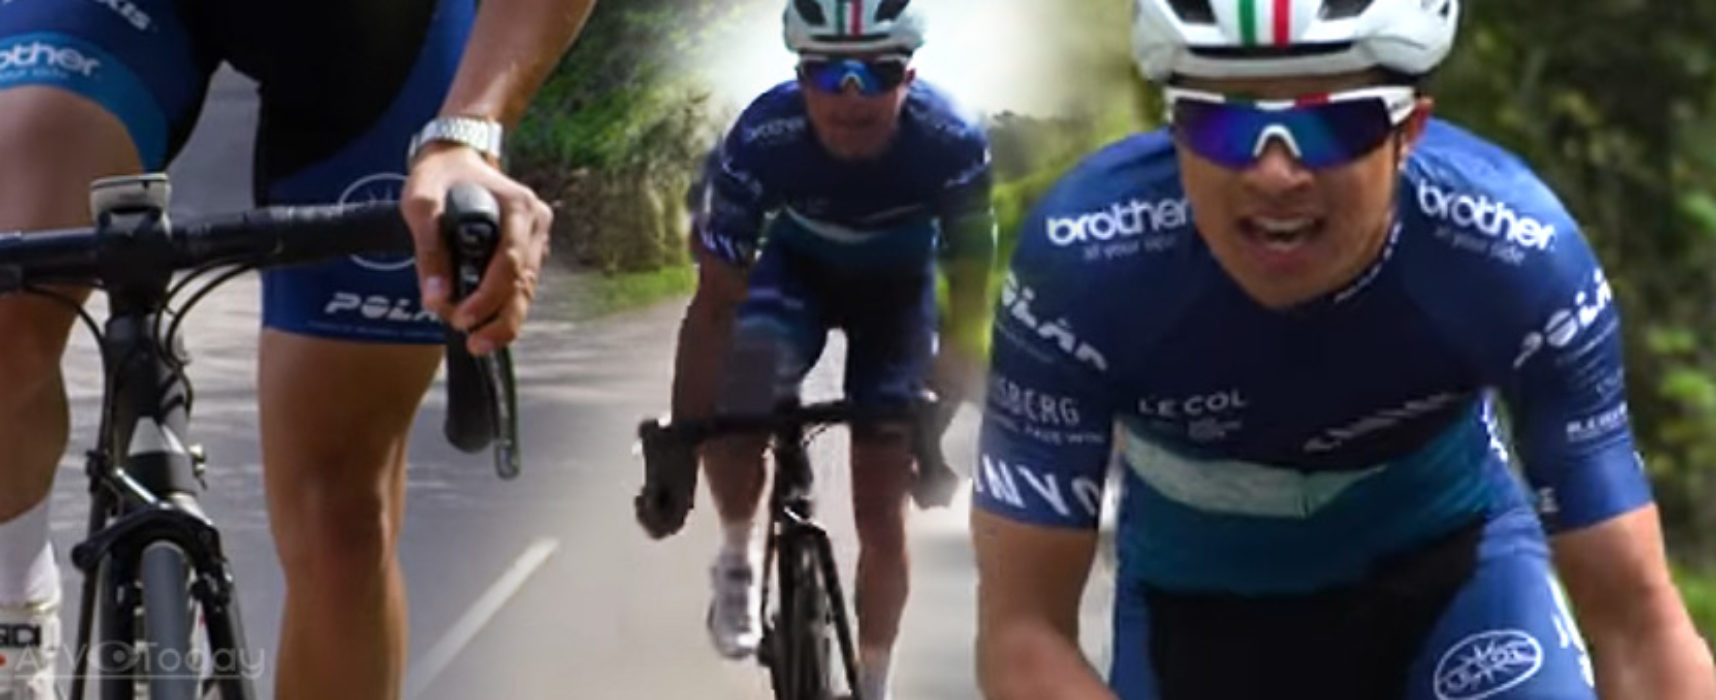 ITV4 return to the Tour de France